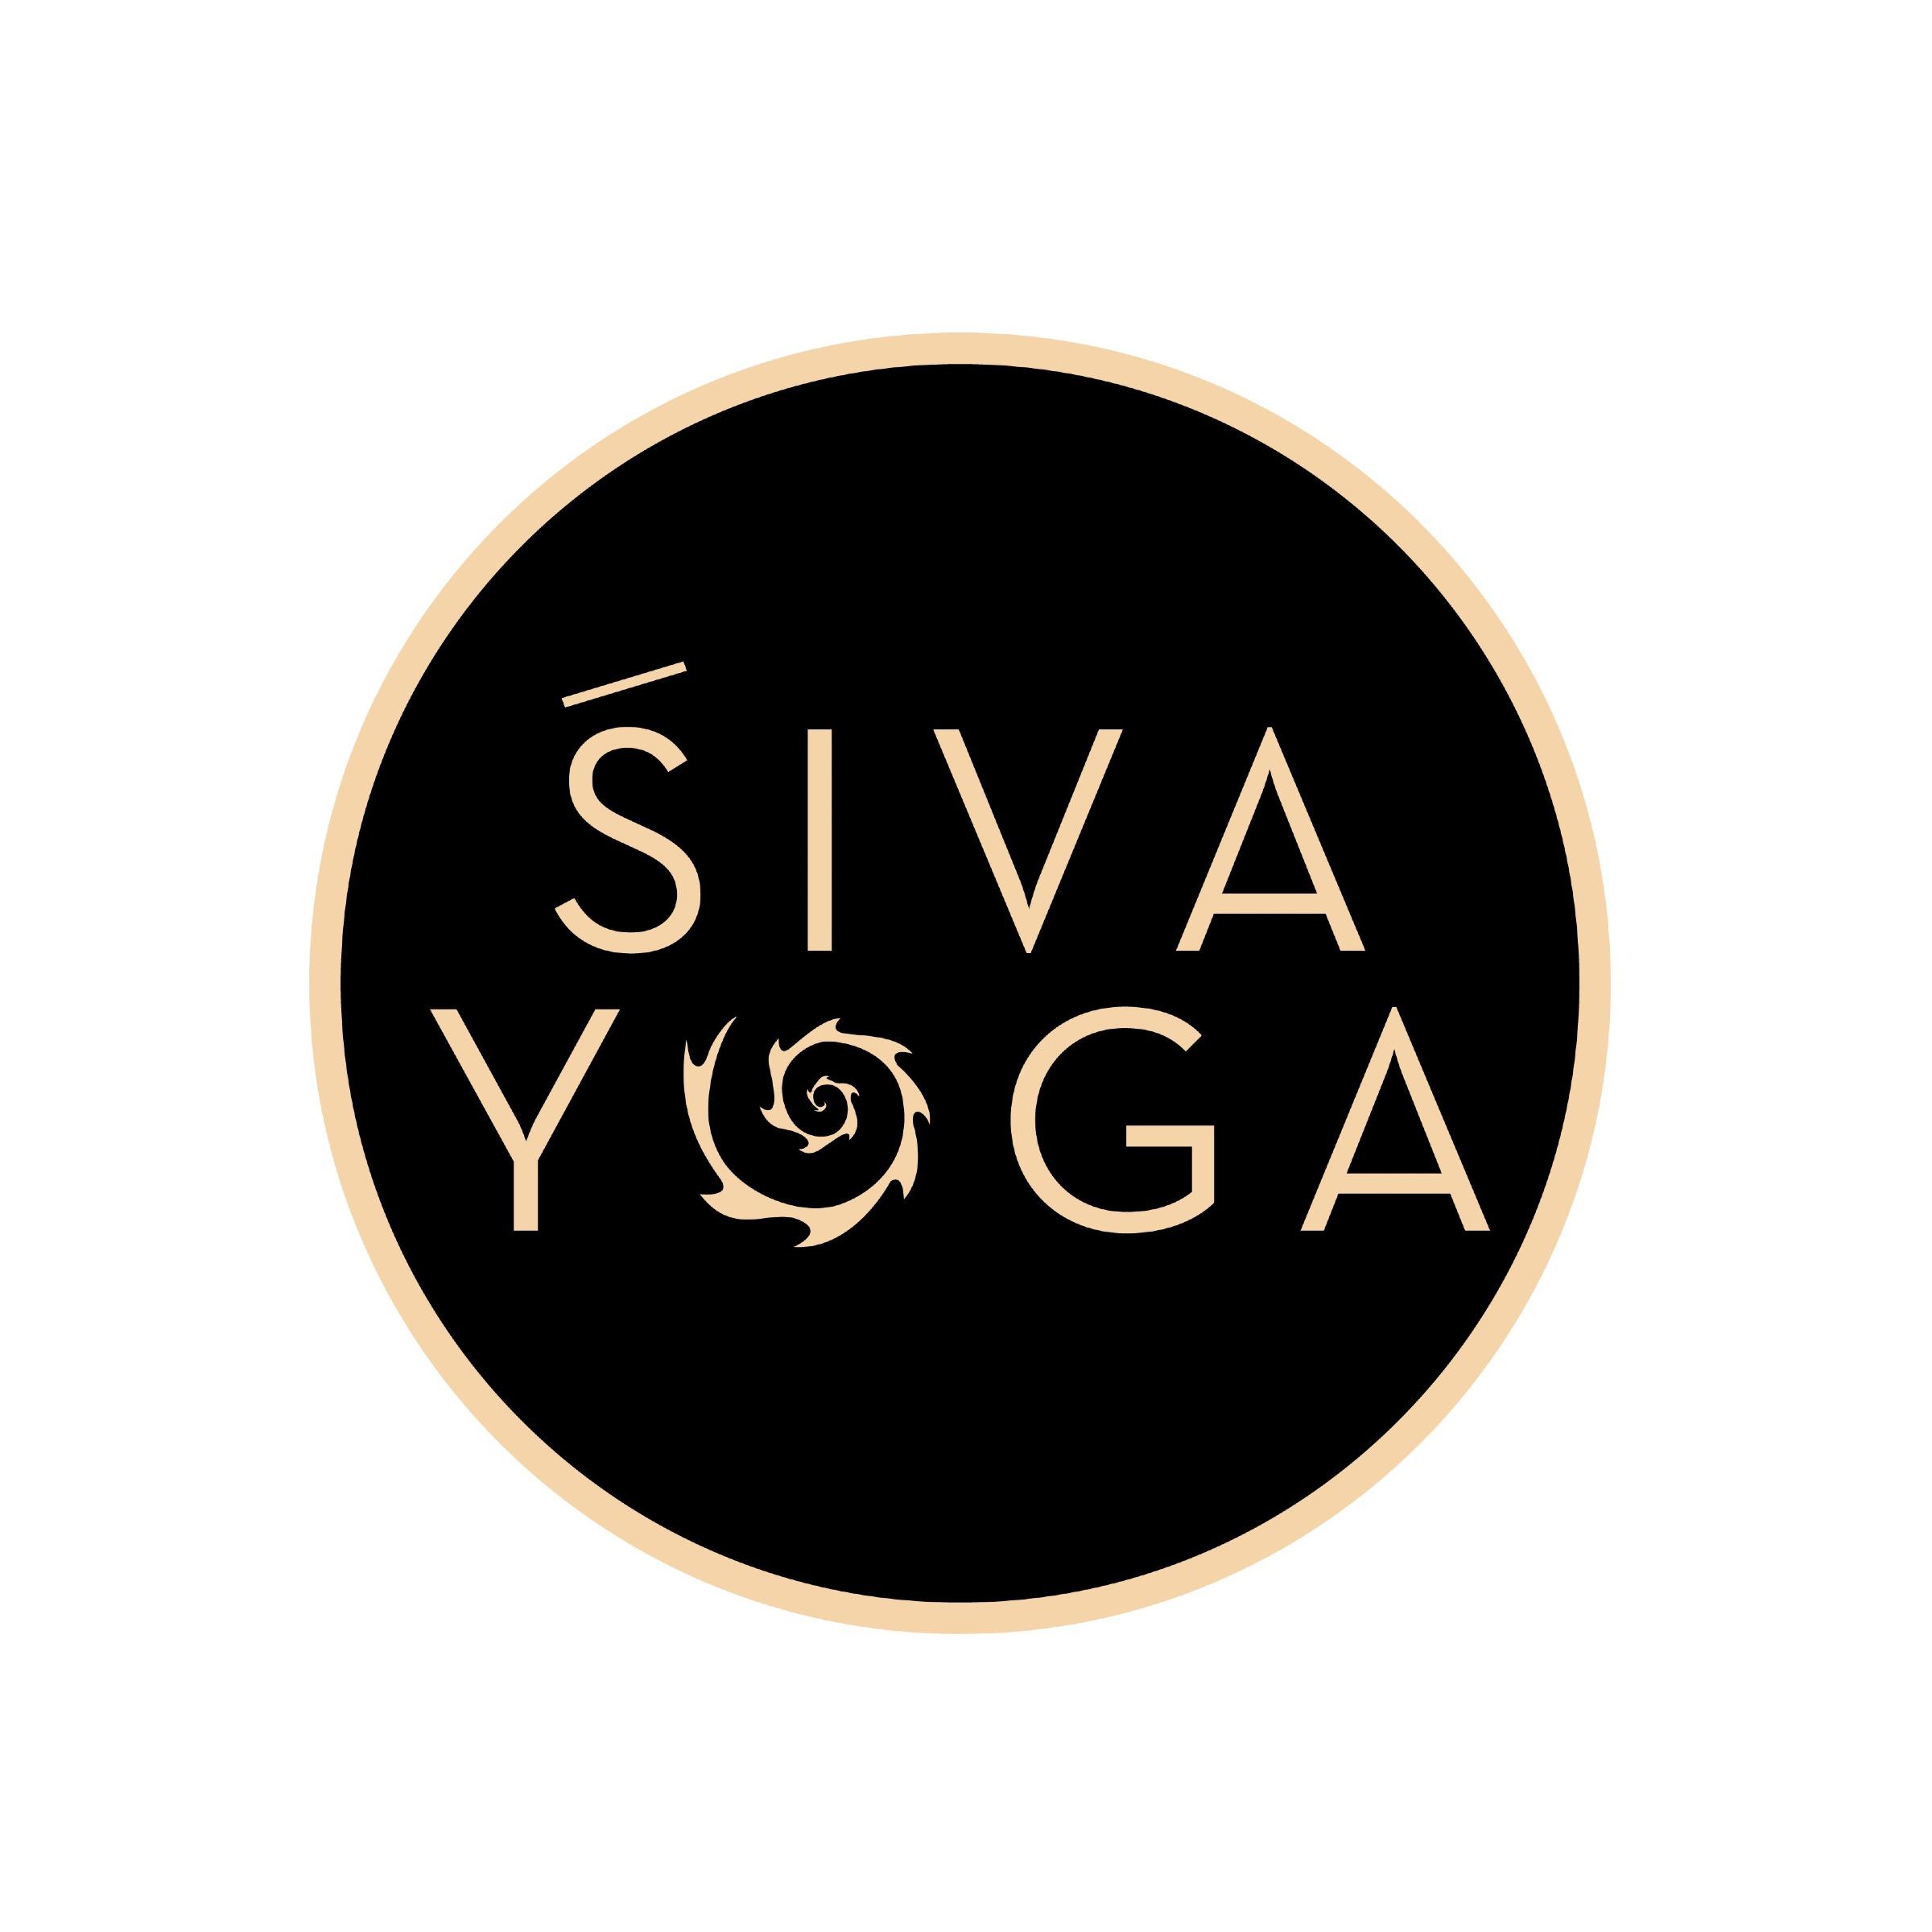 Siva Yoga